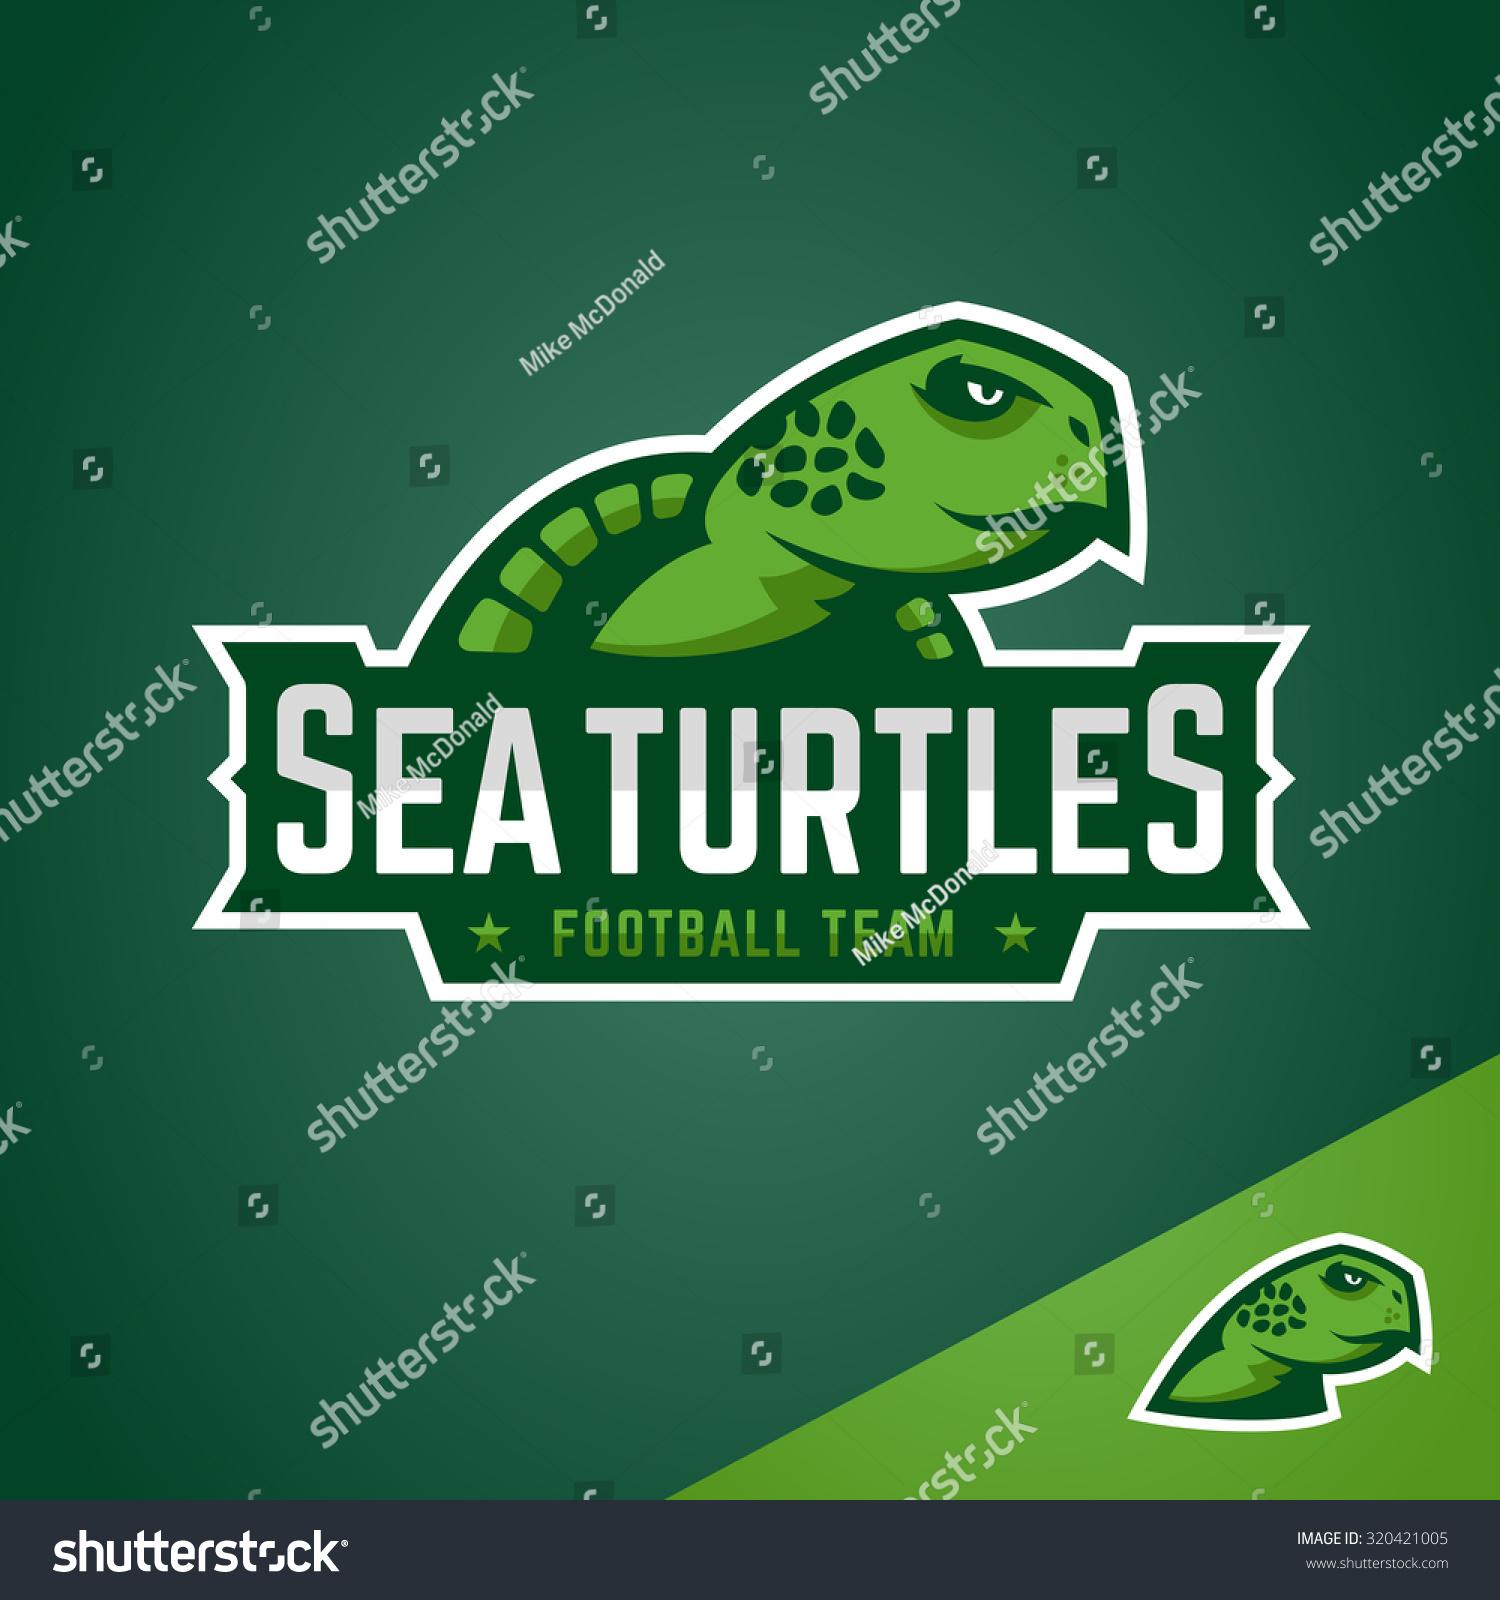 angry turtle logo - photo #29